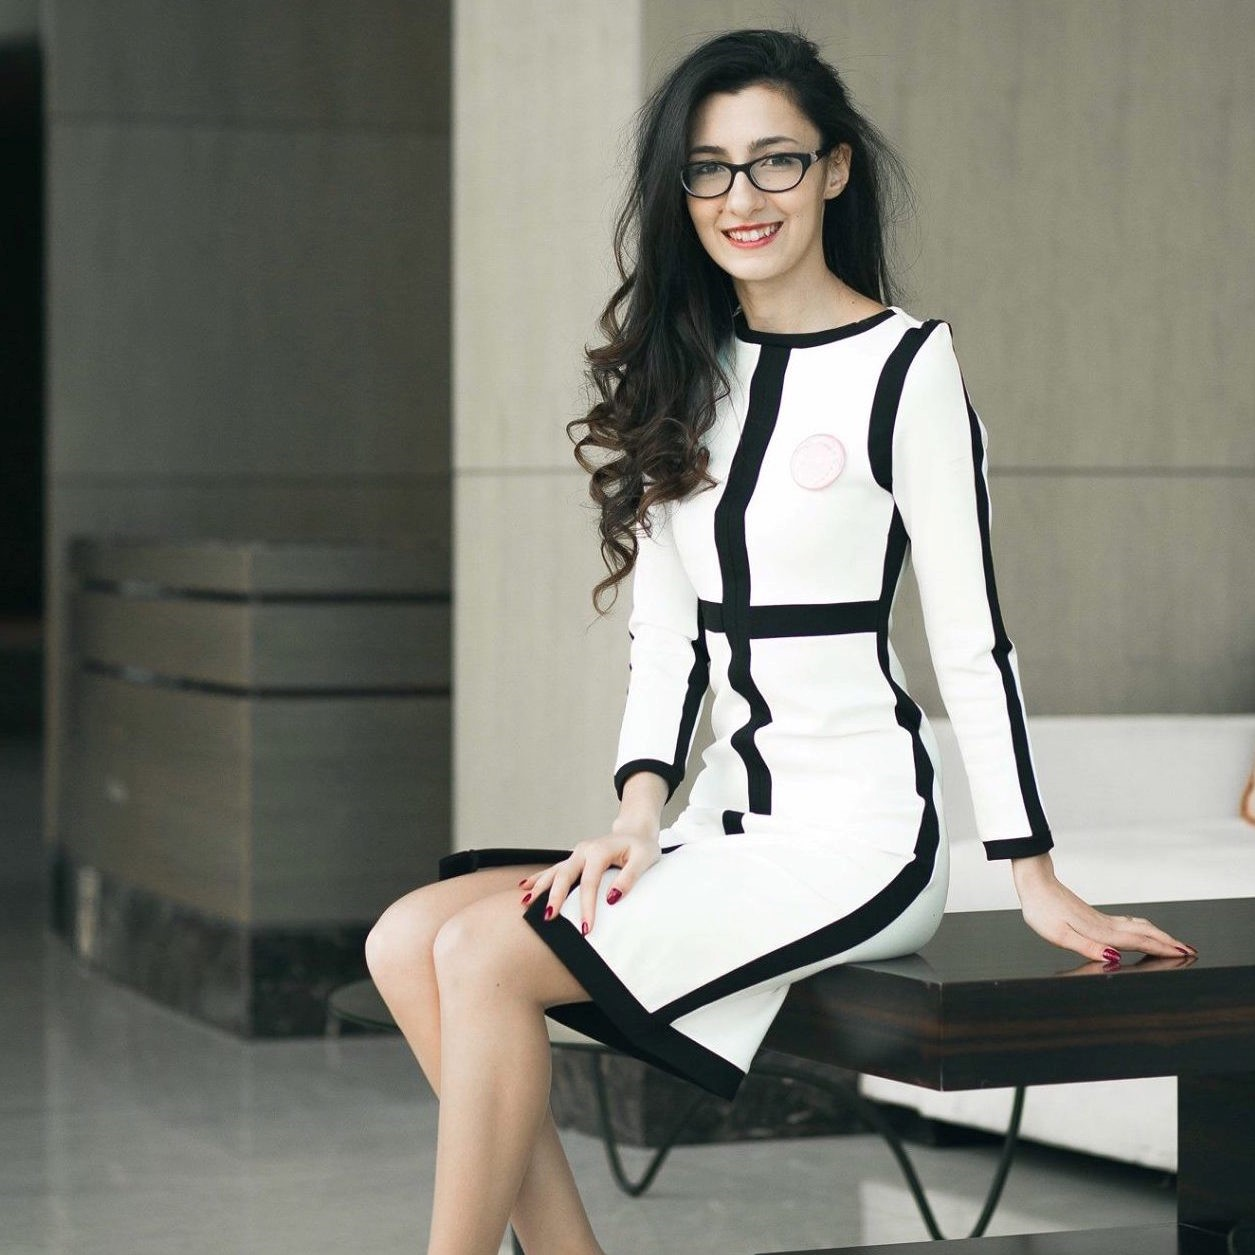 Zara Apetrei Huseynova